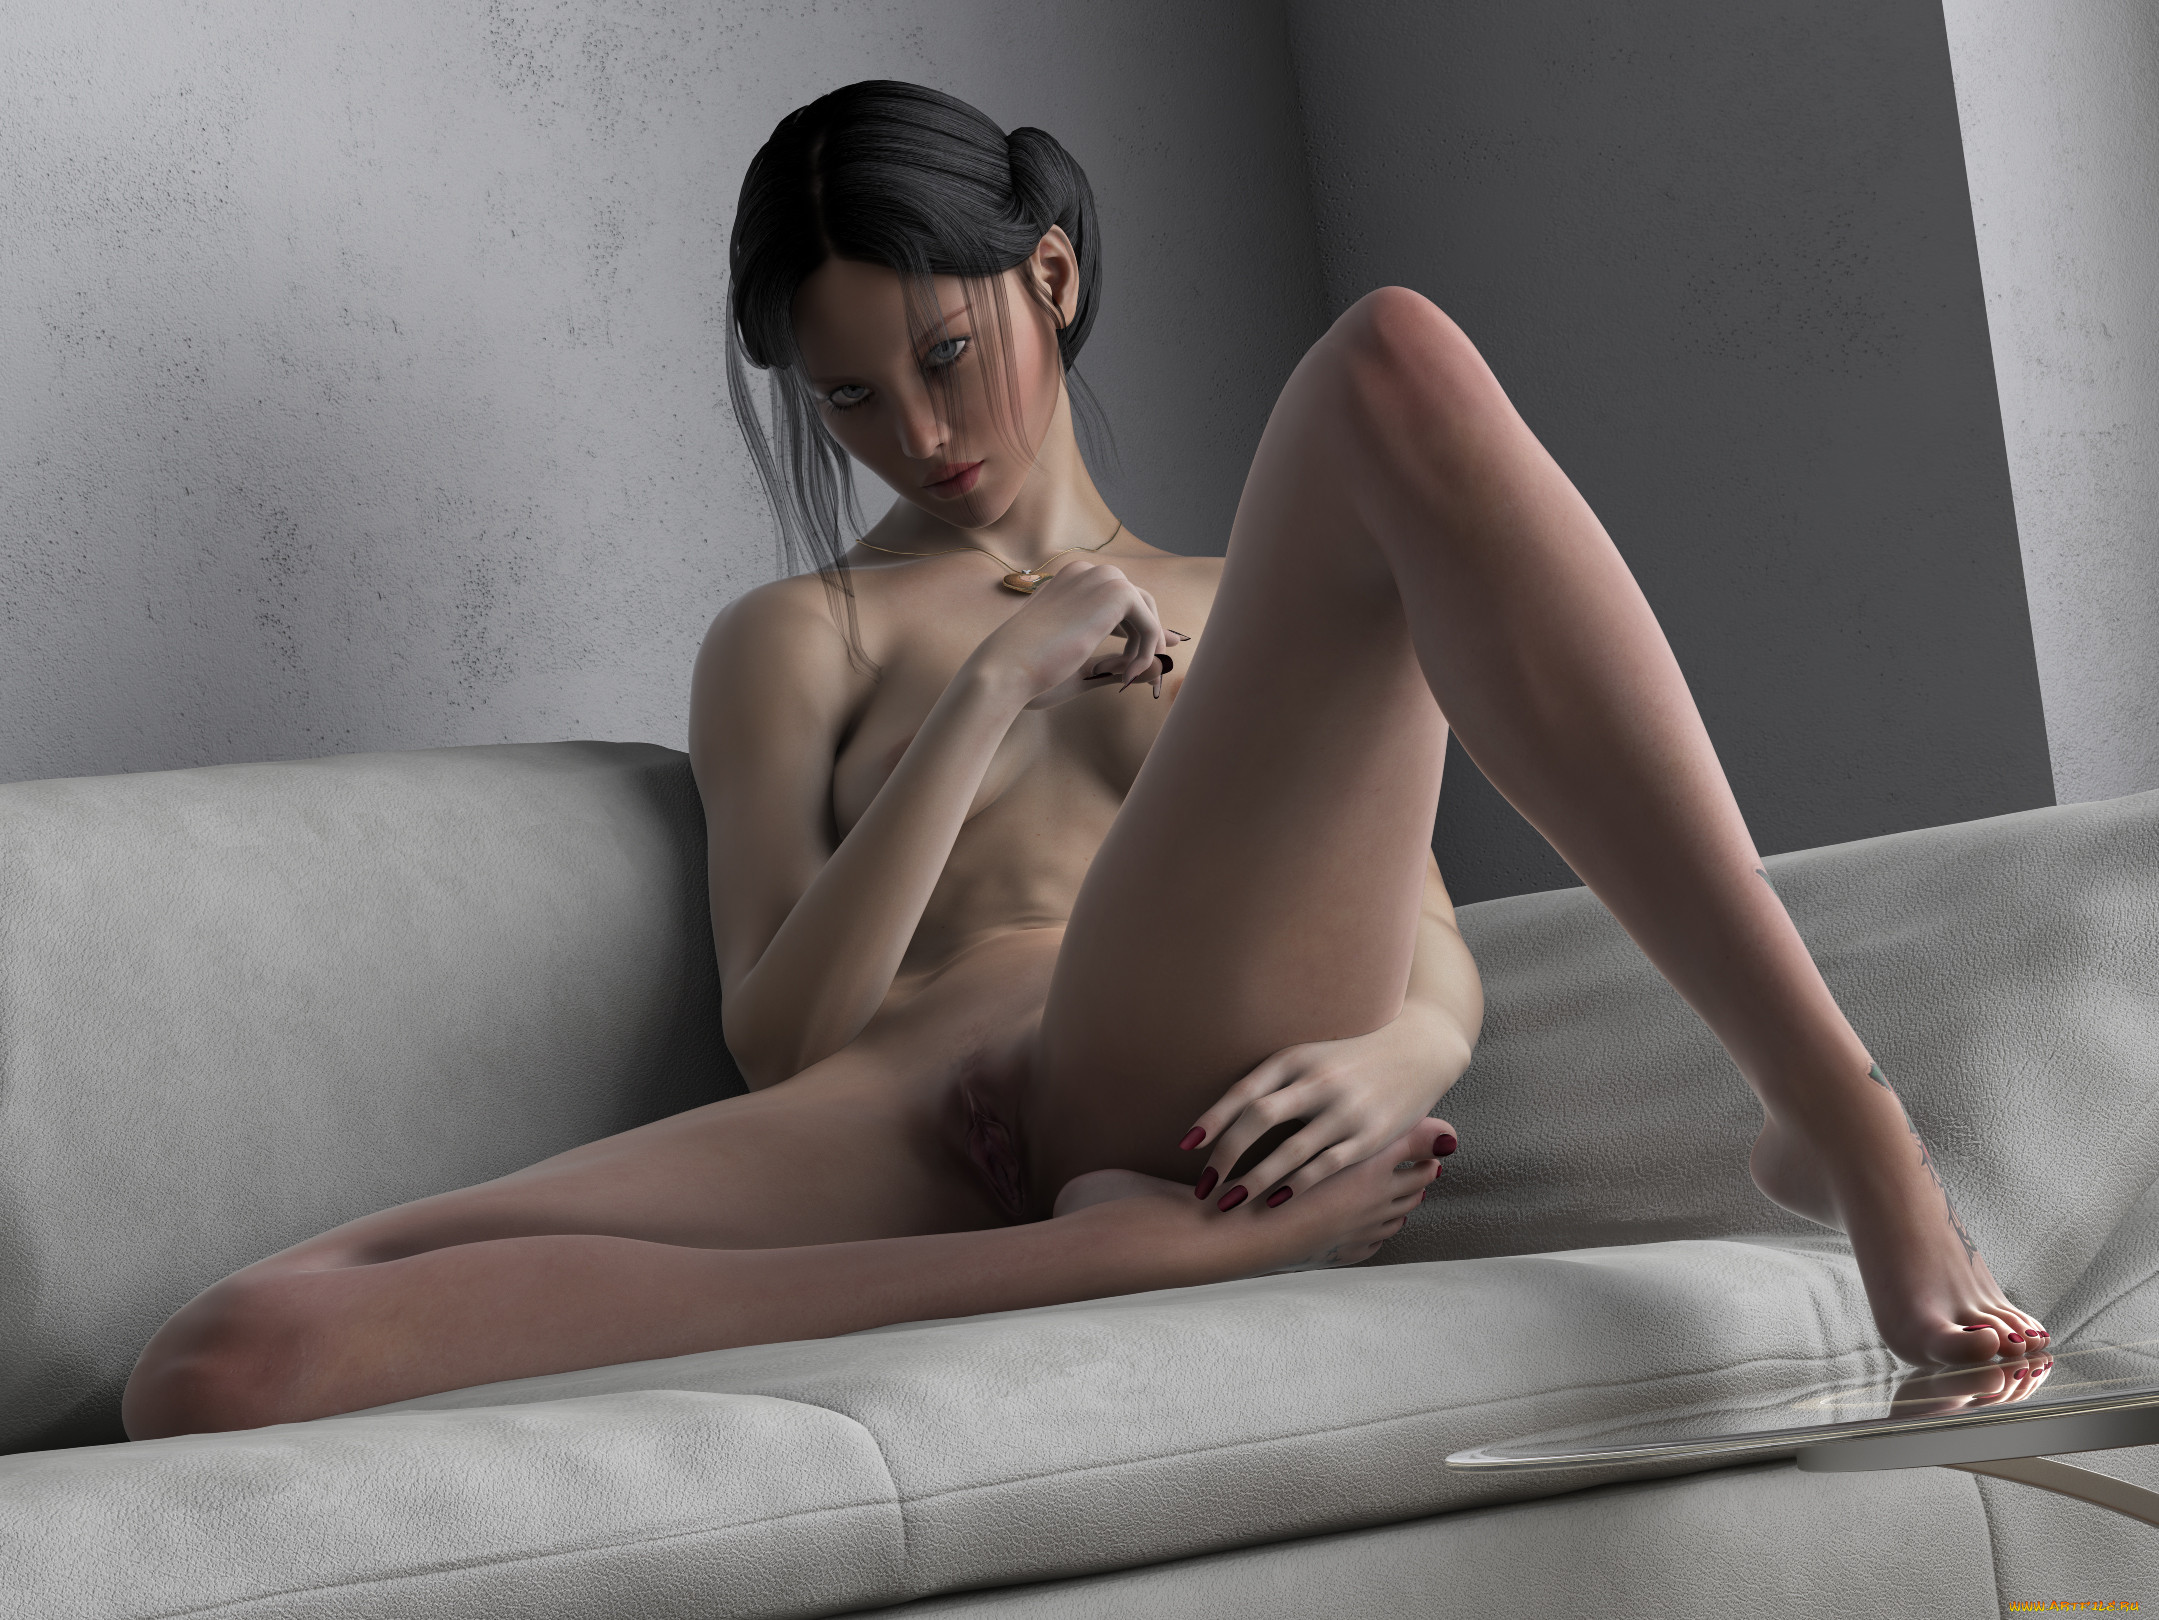 онлайн эротика 3д